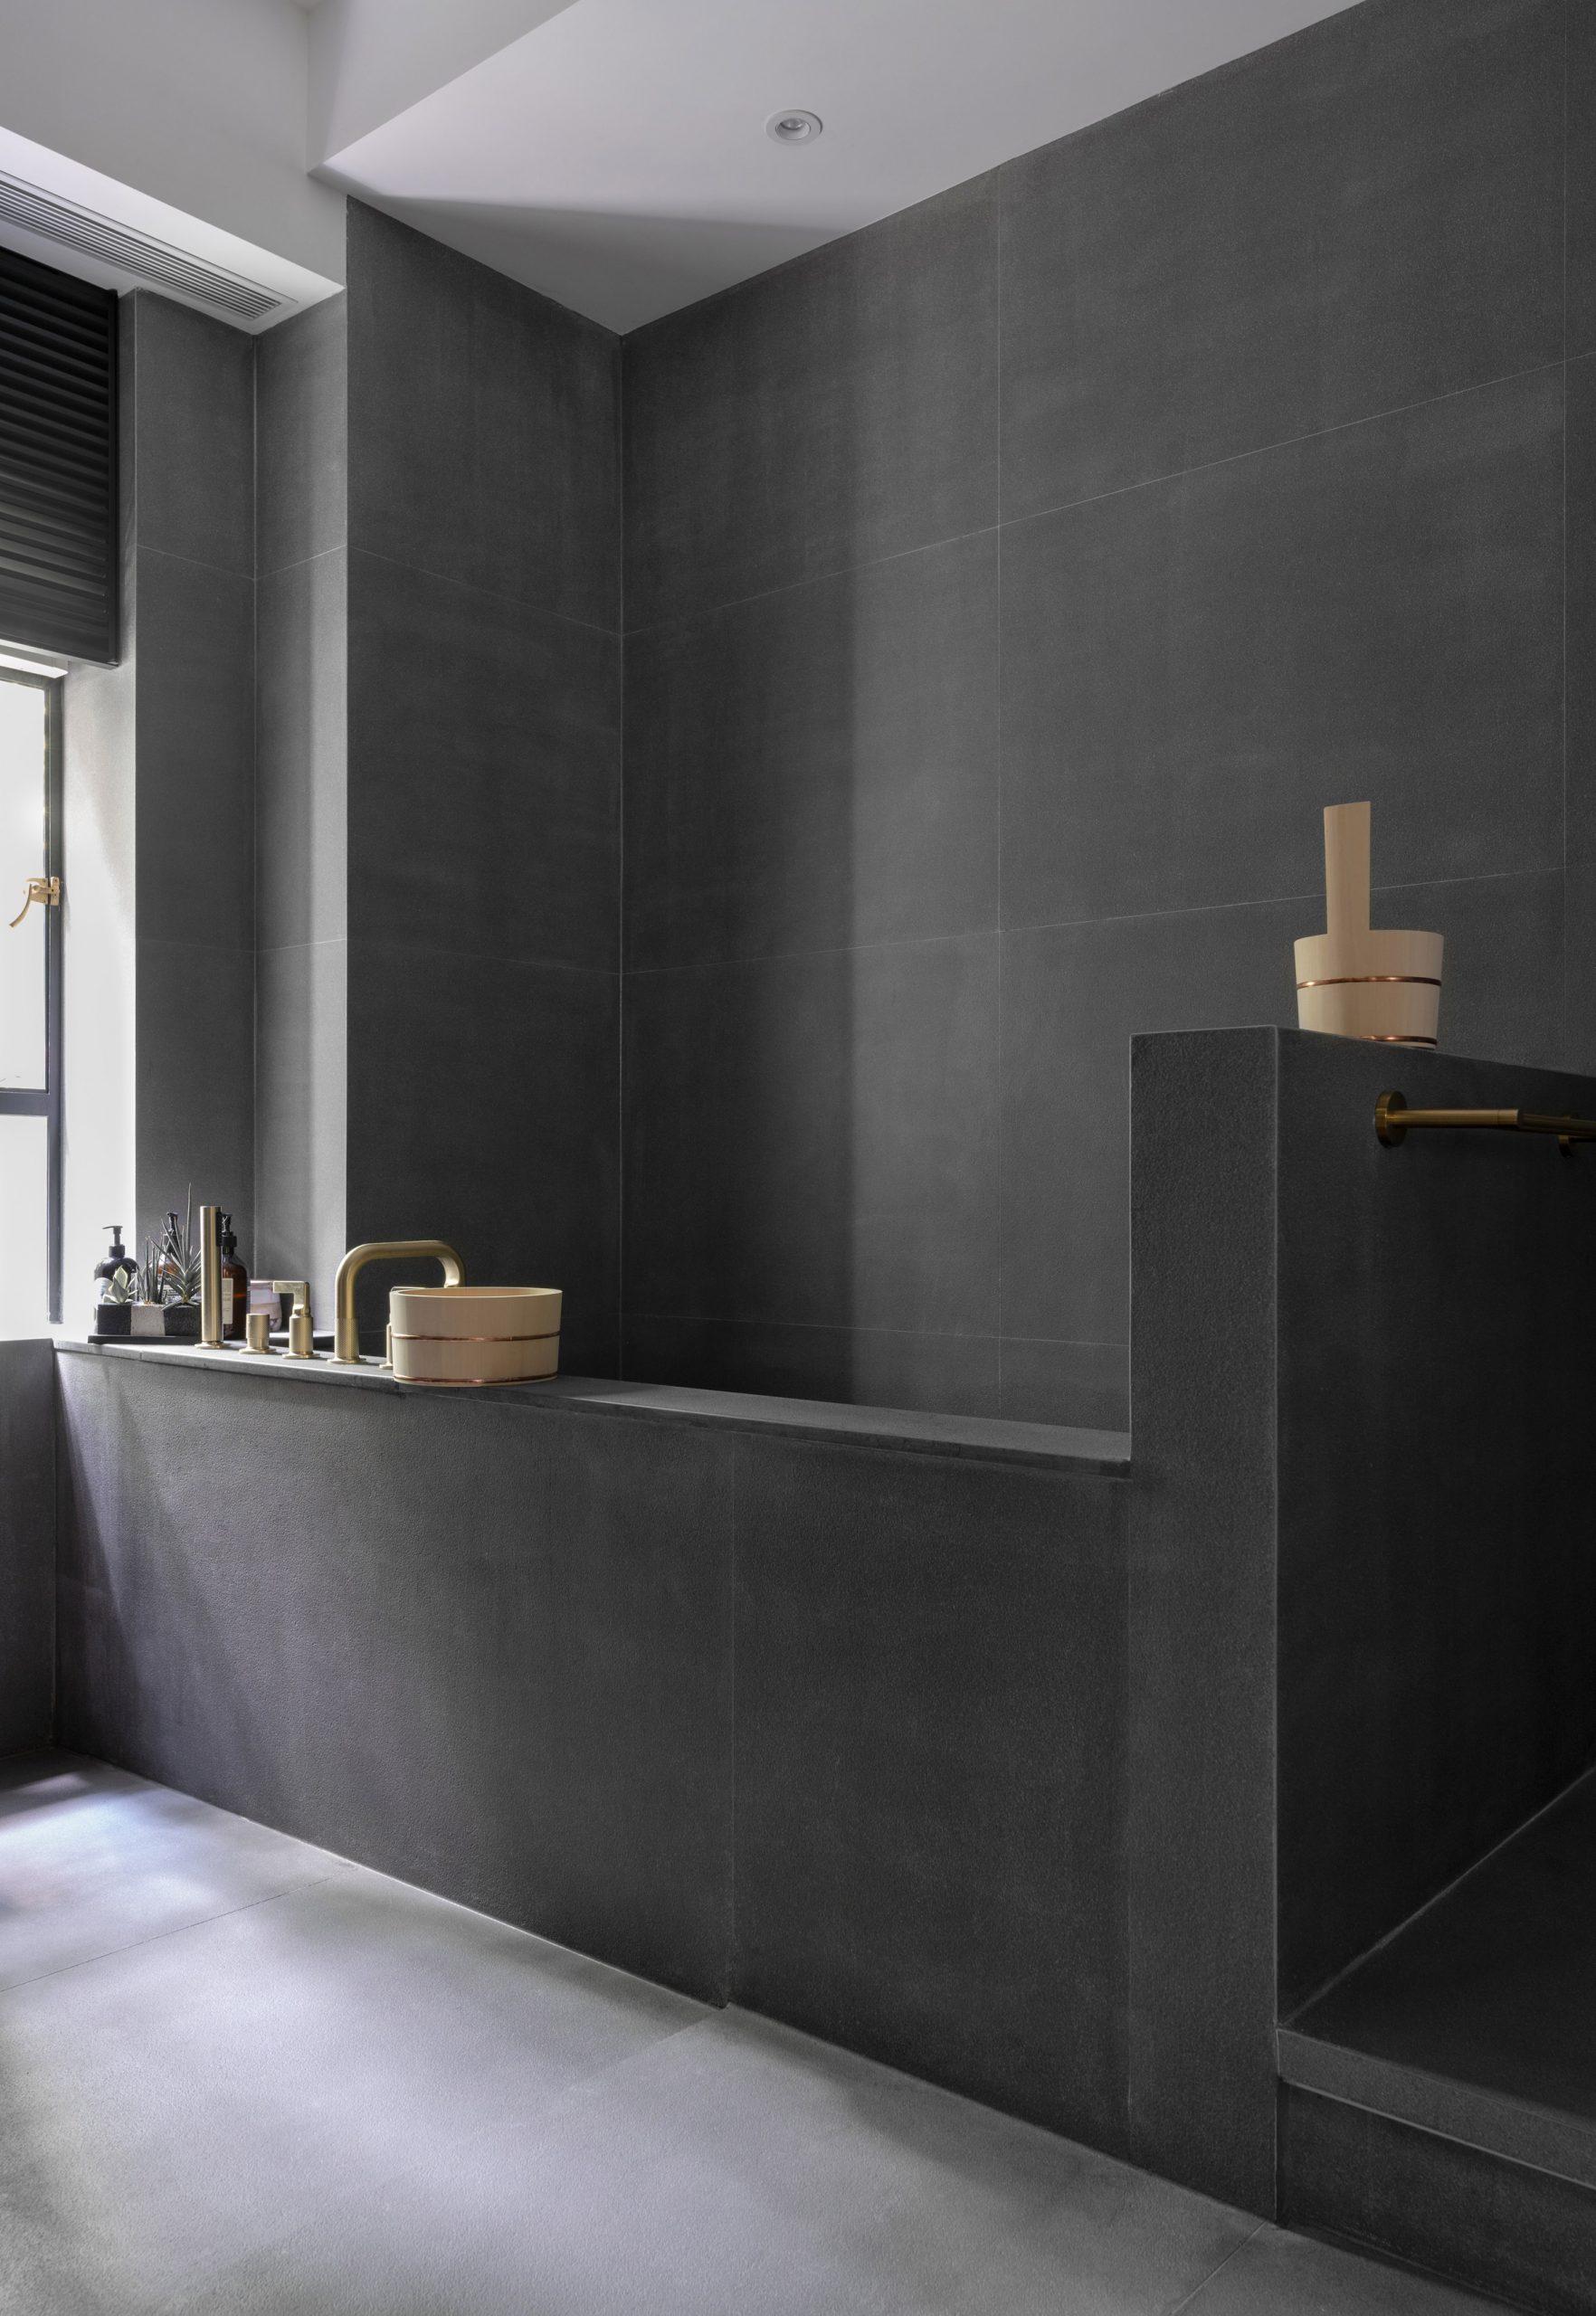 Acid-washed granite soaking tub in Grosvenor Residence by Lim + Lu